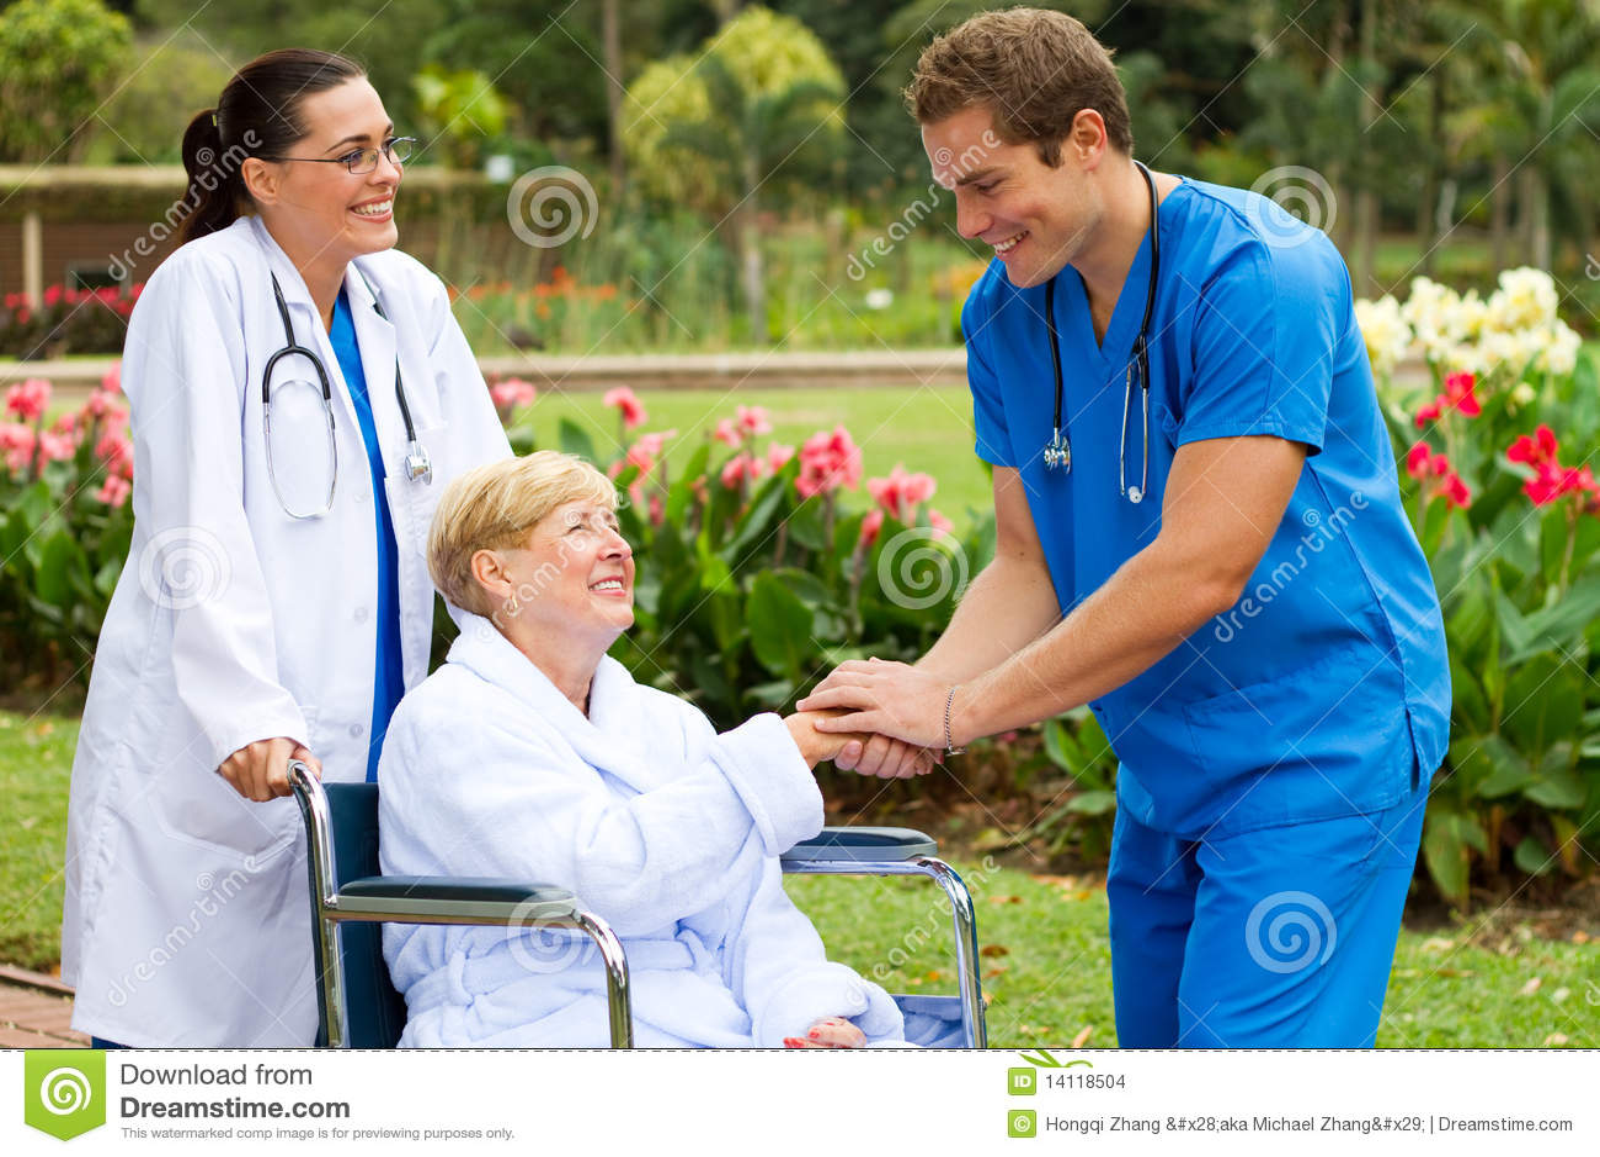 Nurse meet patient